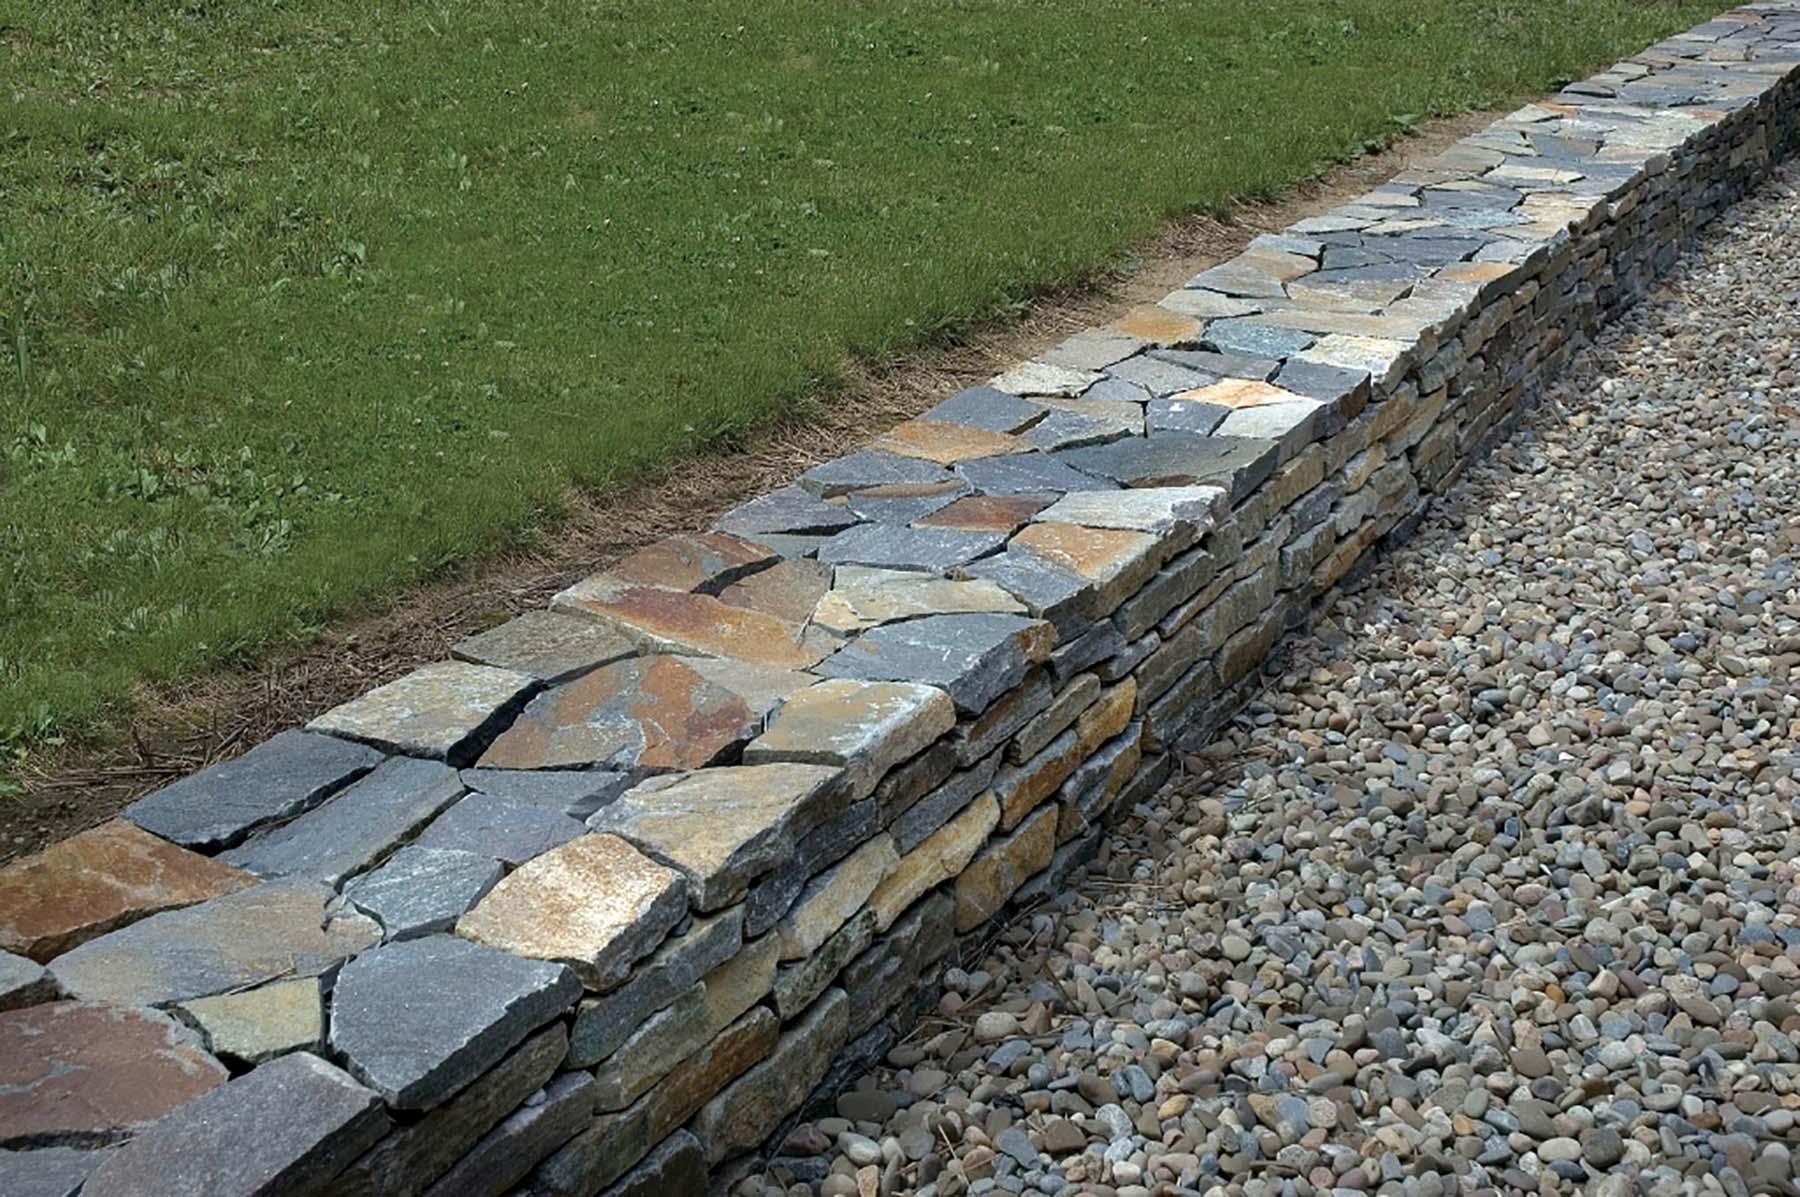 saratoga granite mosaic natural stone retaining wall